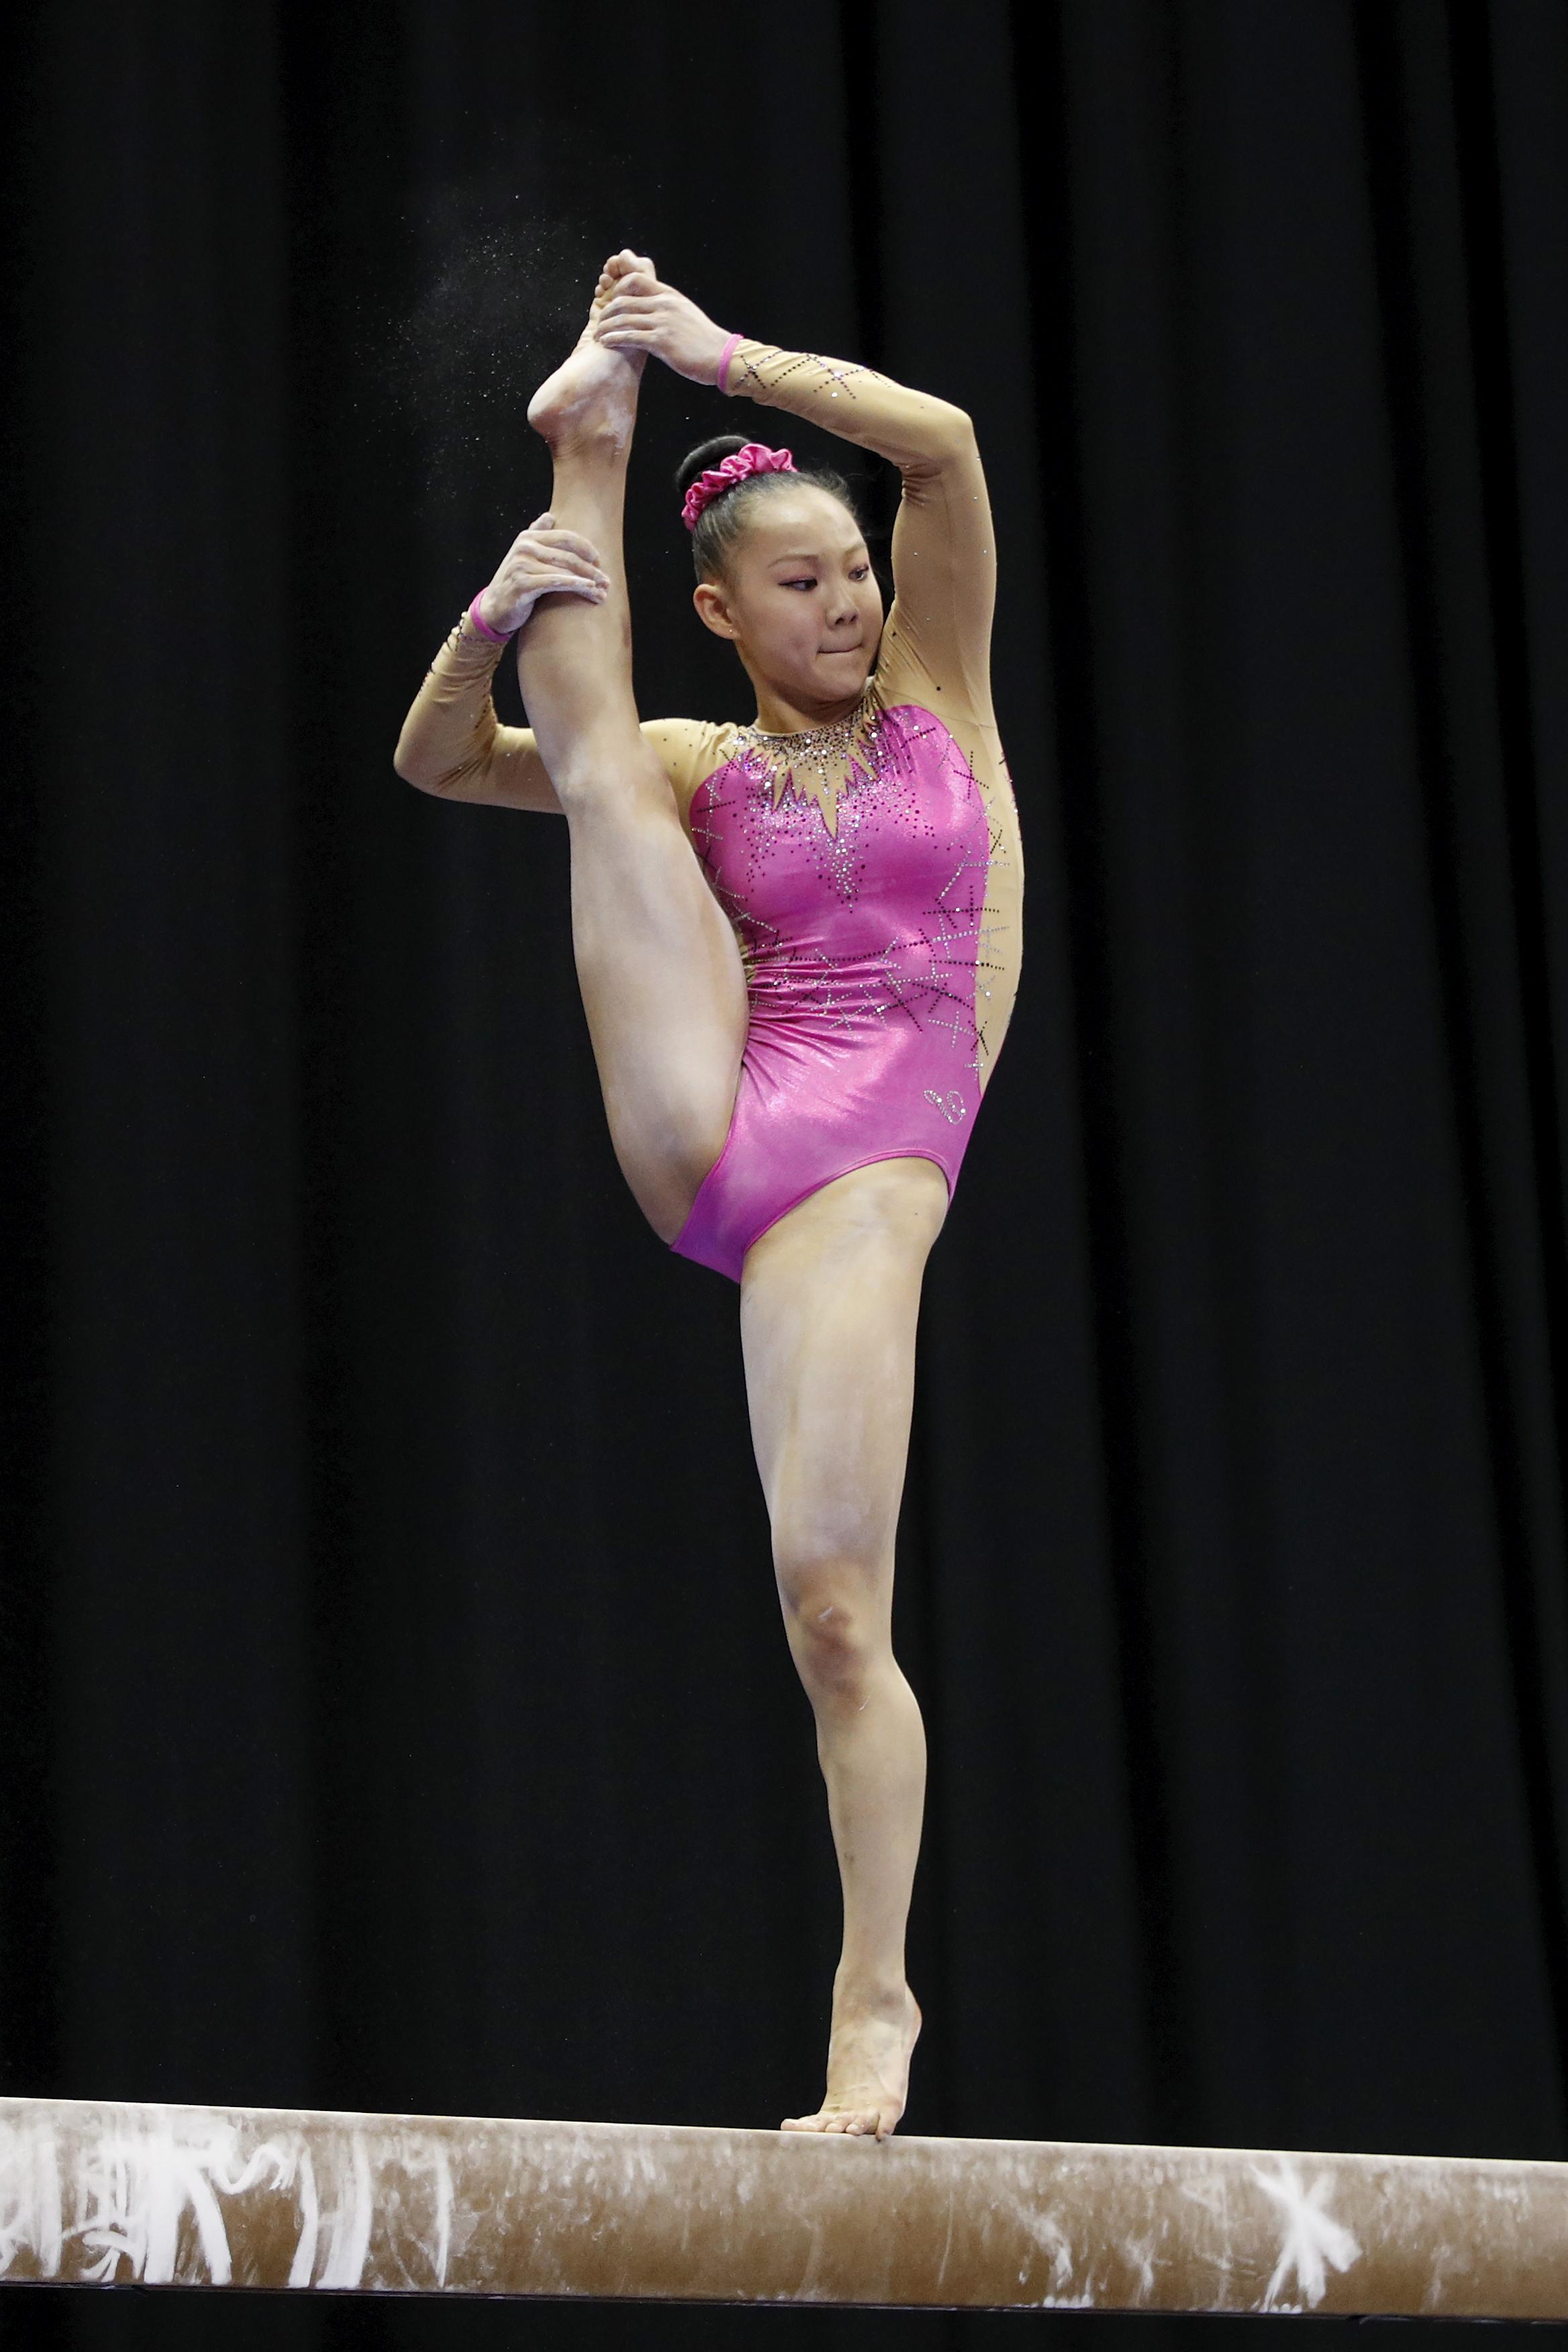 Kara Eaker Gymnastics